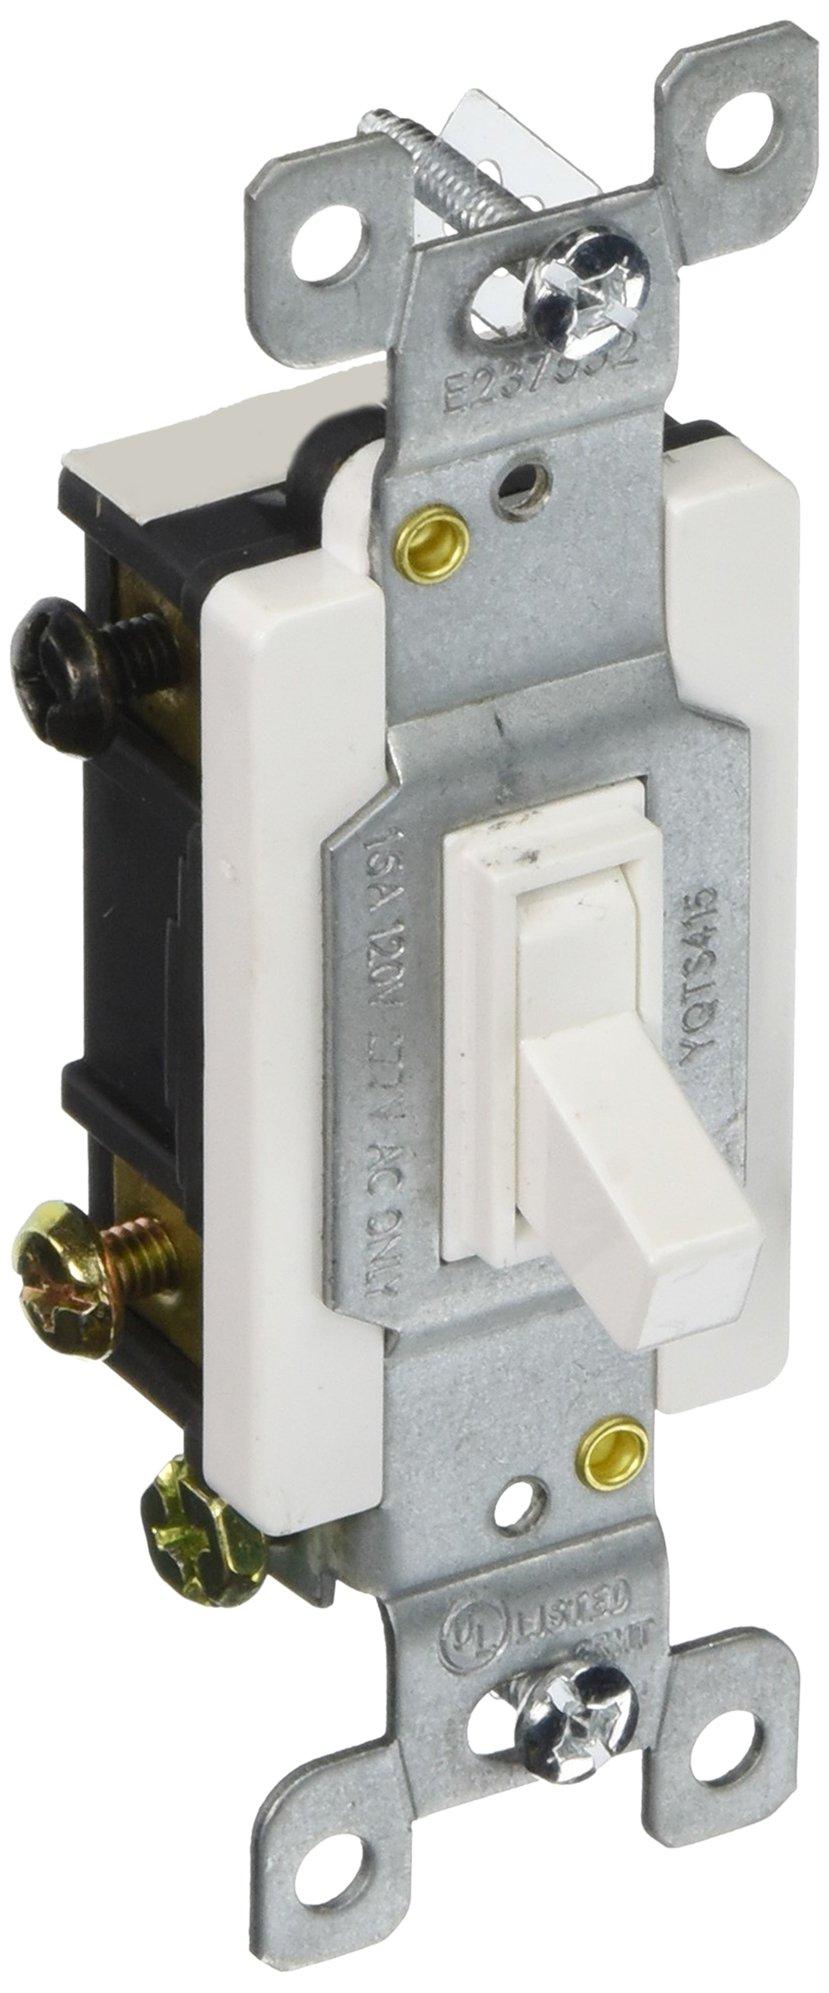 Morris 82041 Toggle Switch, 4 Way, 4 Poles, 120V/277V, 15 Amp Current, White